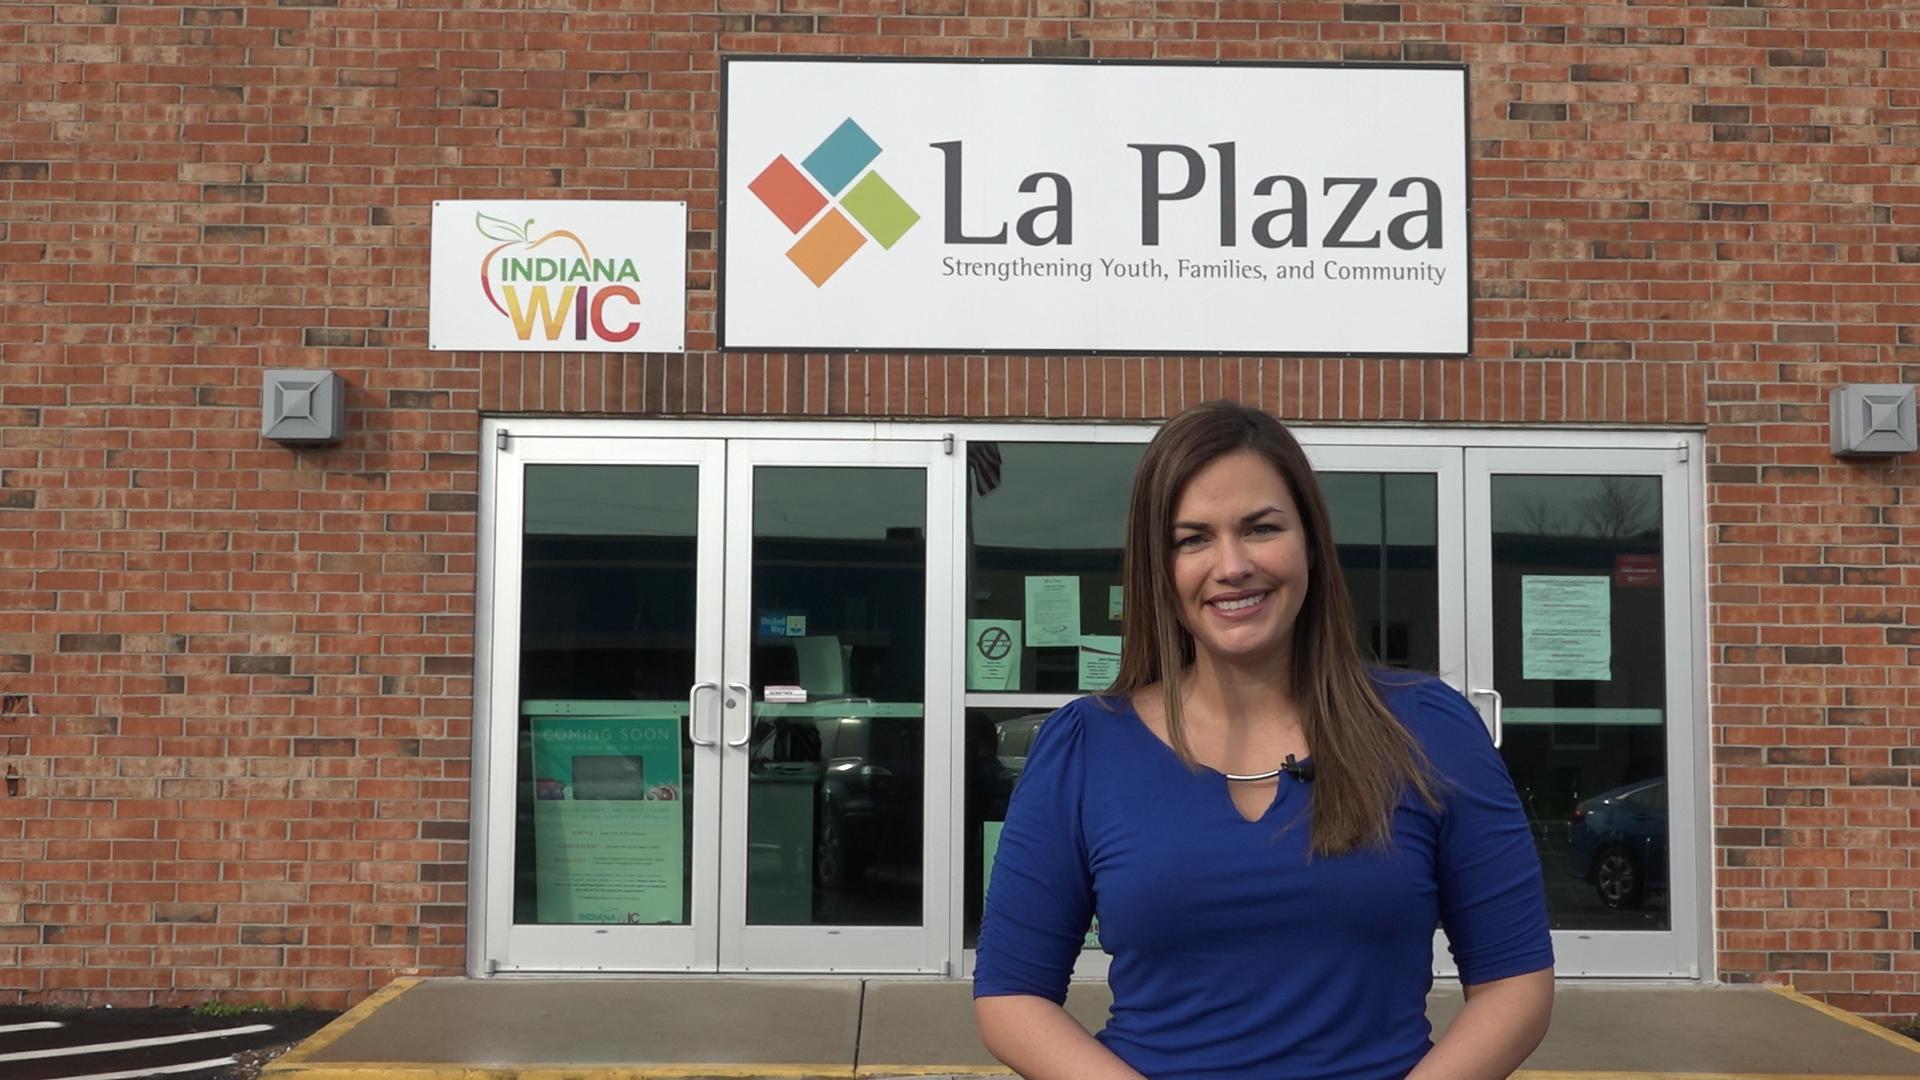 Explorando Indy @ La Plaza